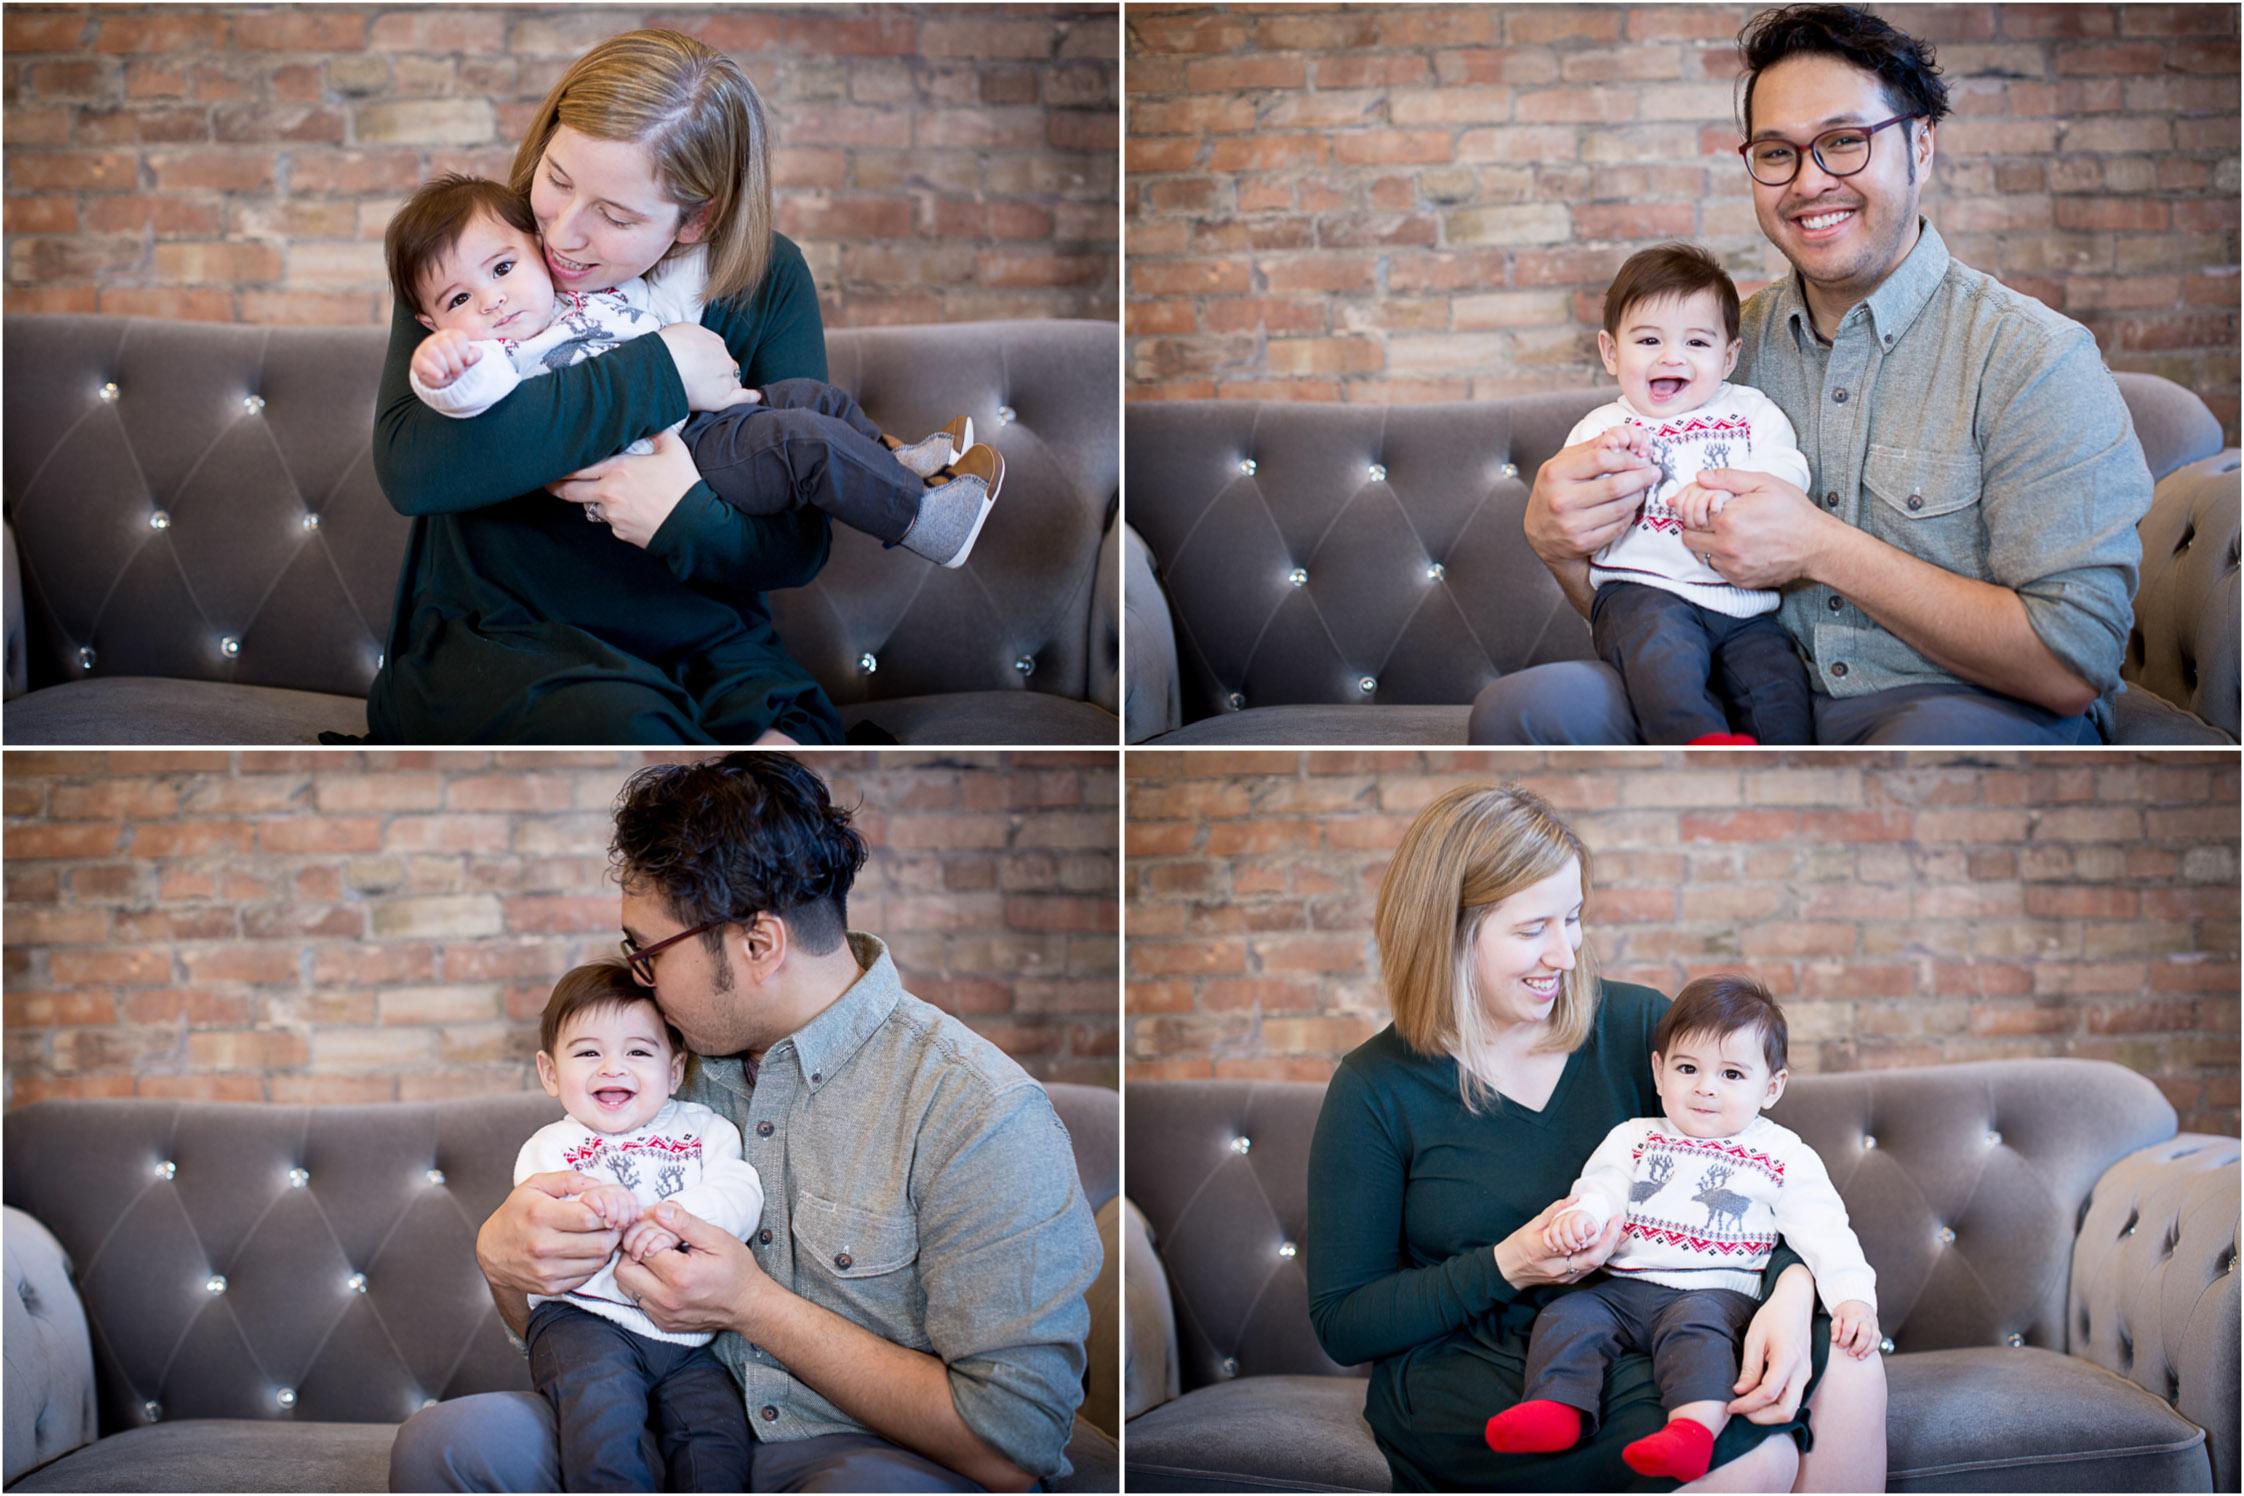 07-mn-studio-family-photgrapher-brick-6-month-old-boy-portrait-gray-velvet-couch-mahonen-photography.jpg